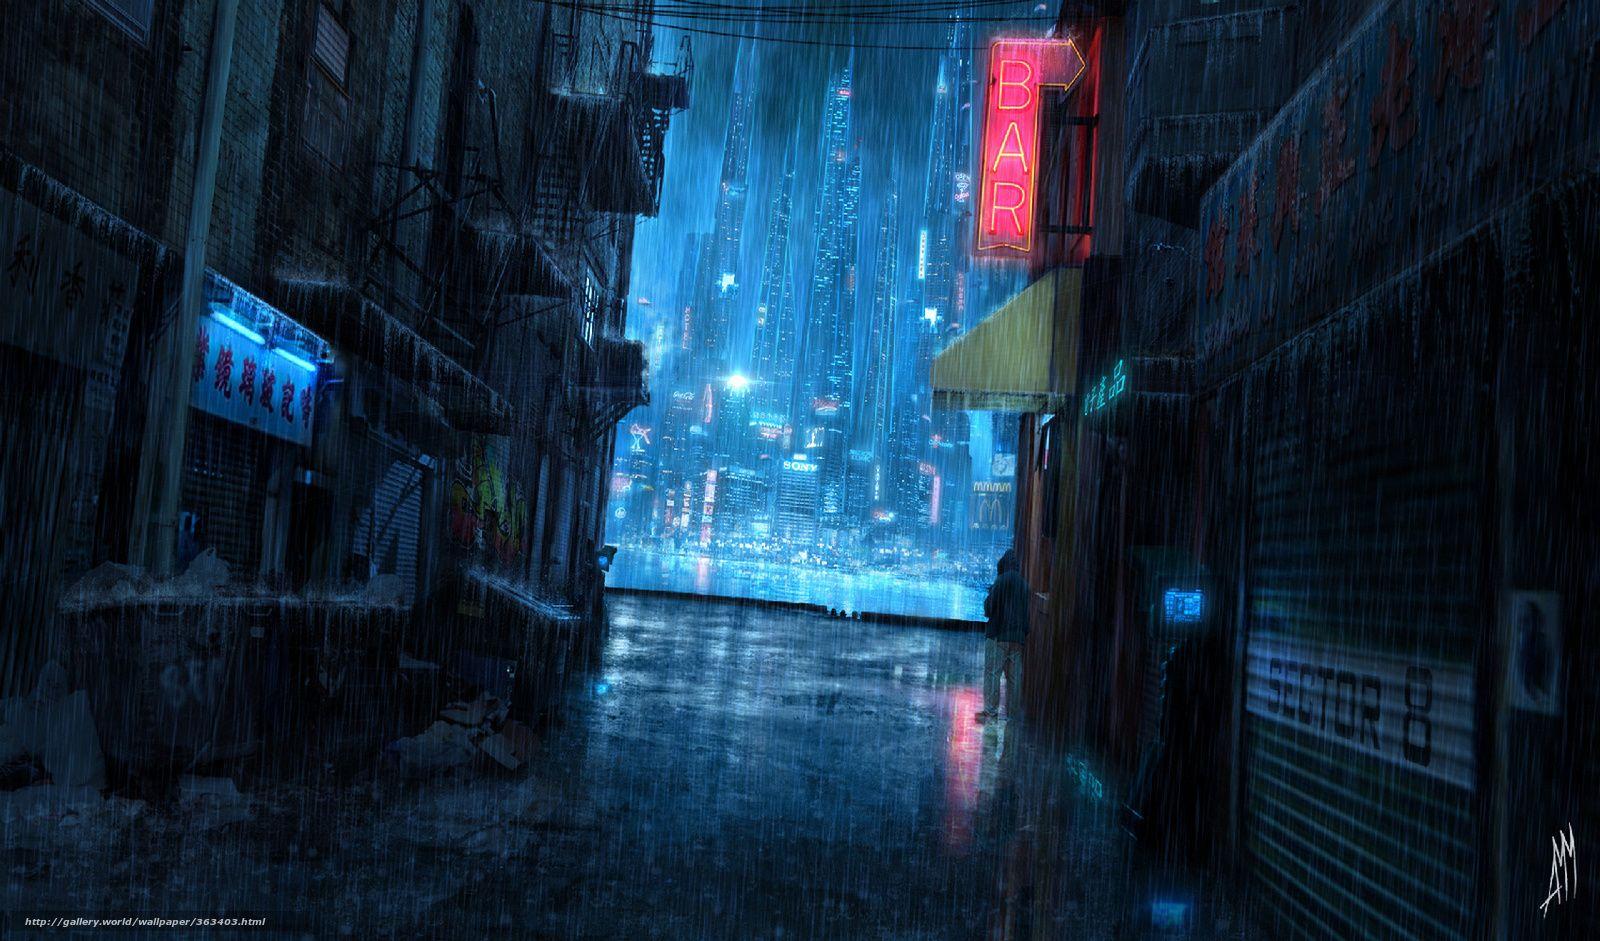 dark future cyberpunk brutalismo rascacielos y otras obsesiones pgina